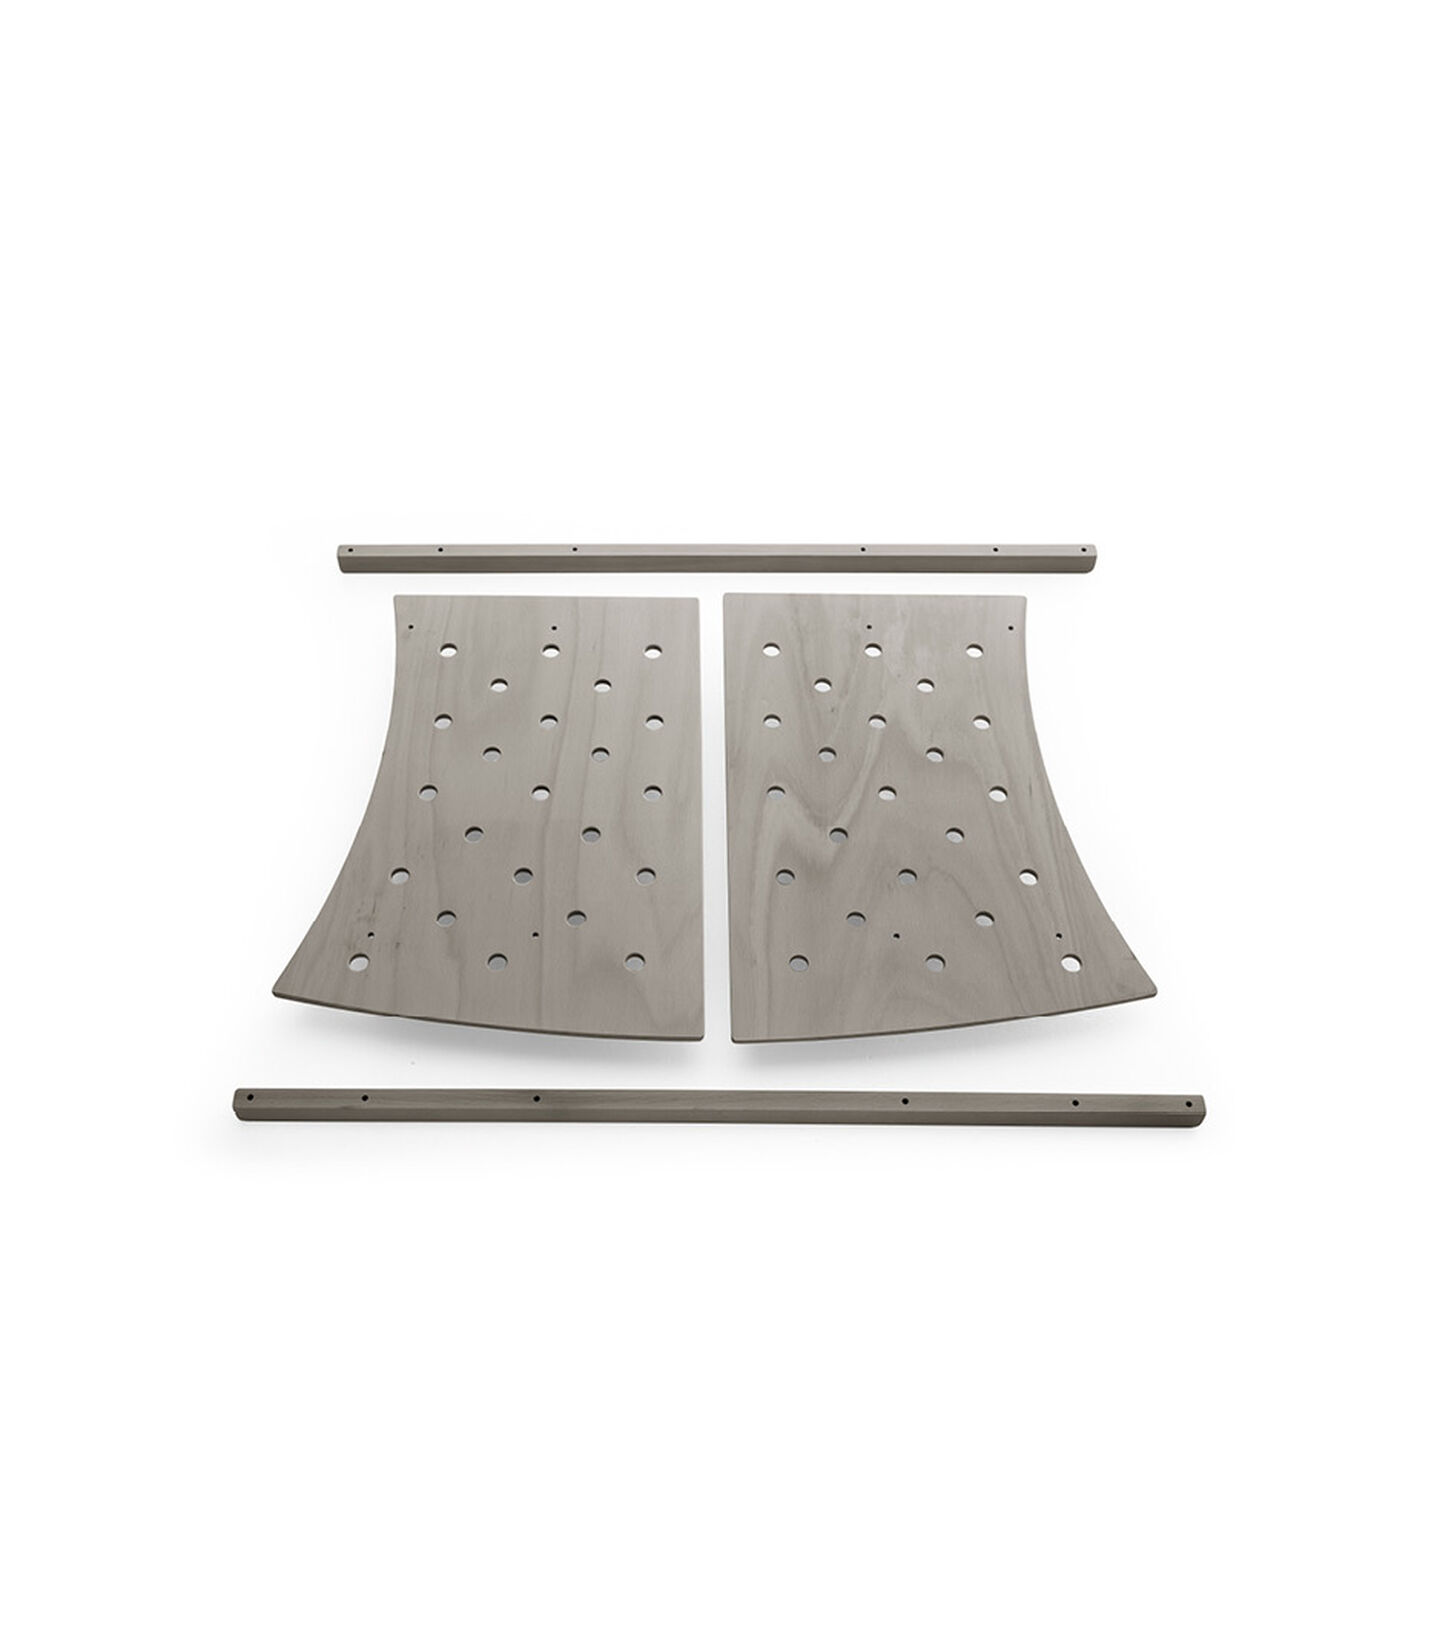 Stokke® Sleepi™ Junior Extension Hazy Grey, Hazy Grey, mainview view 1